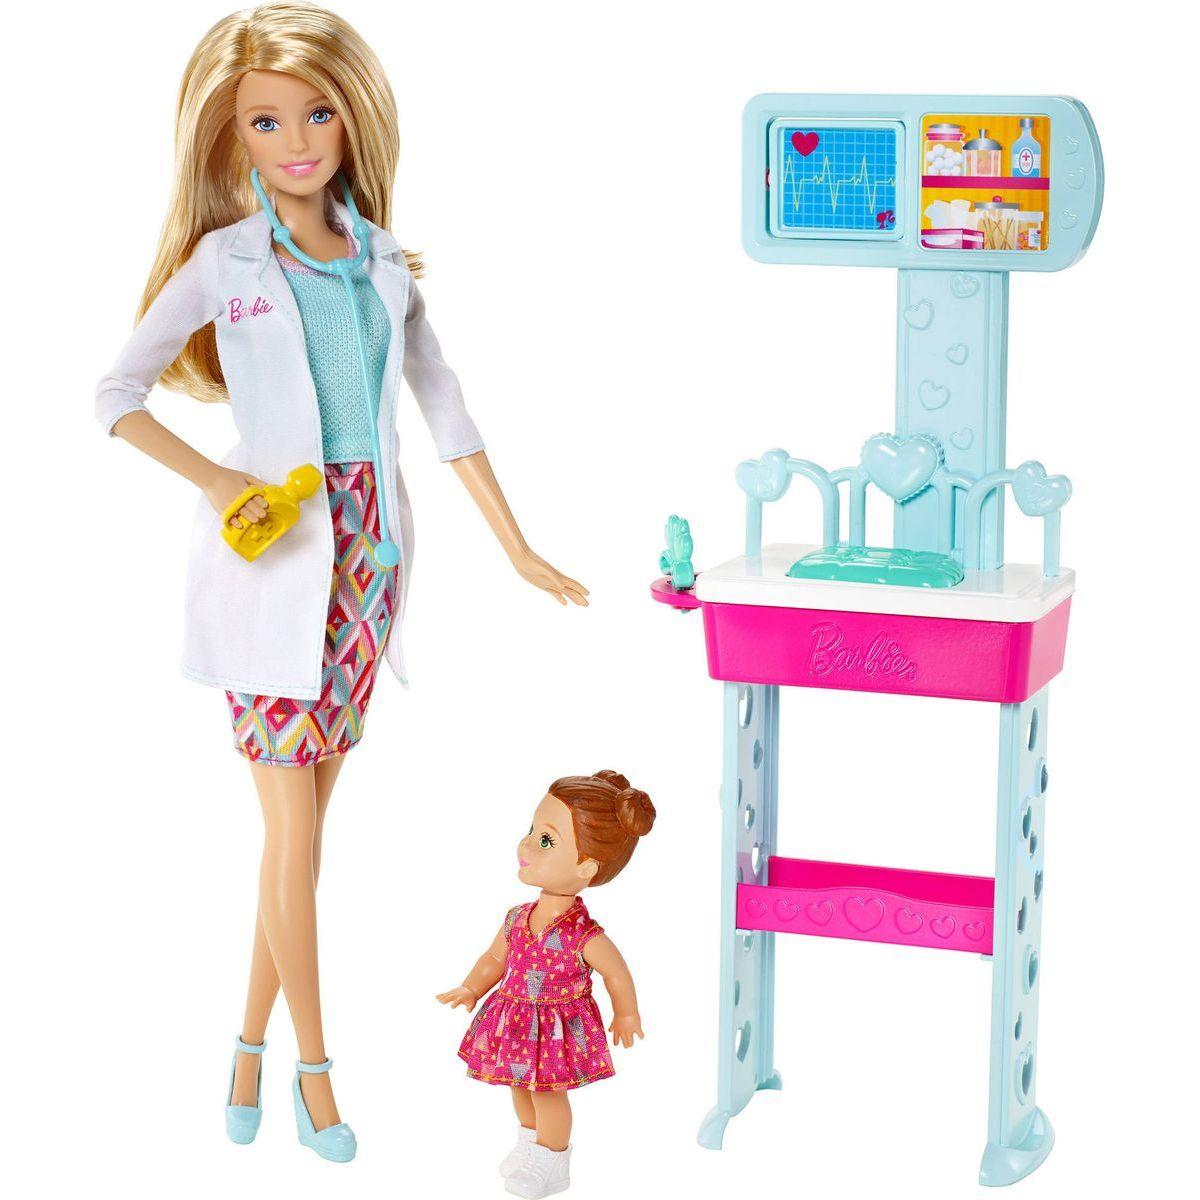 Barbie profese - Lékařka